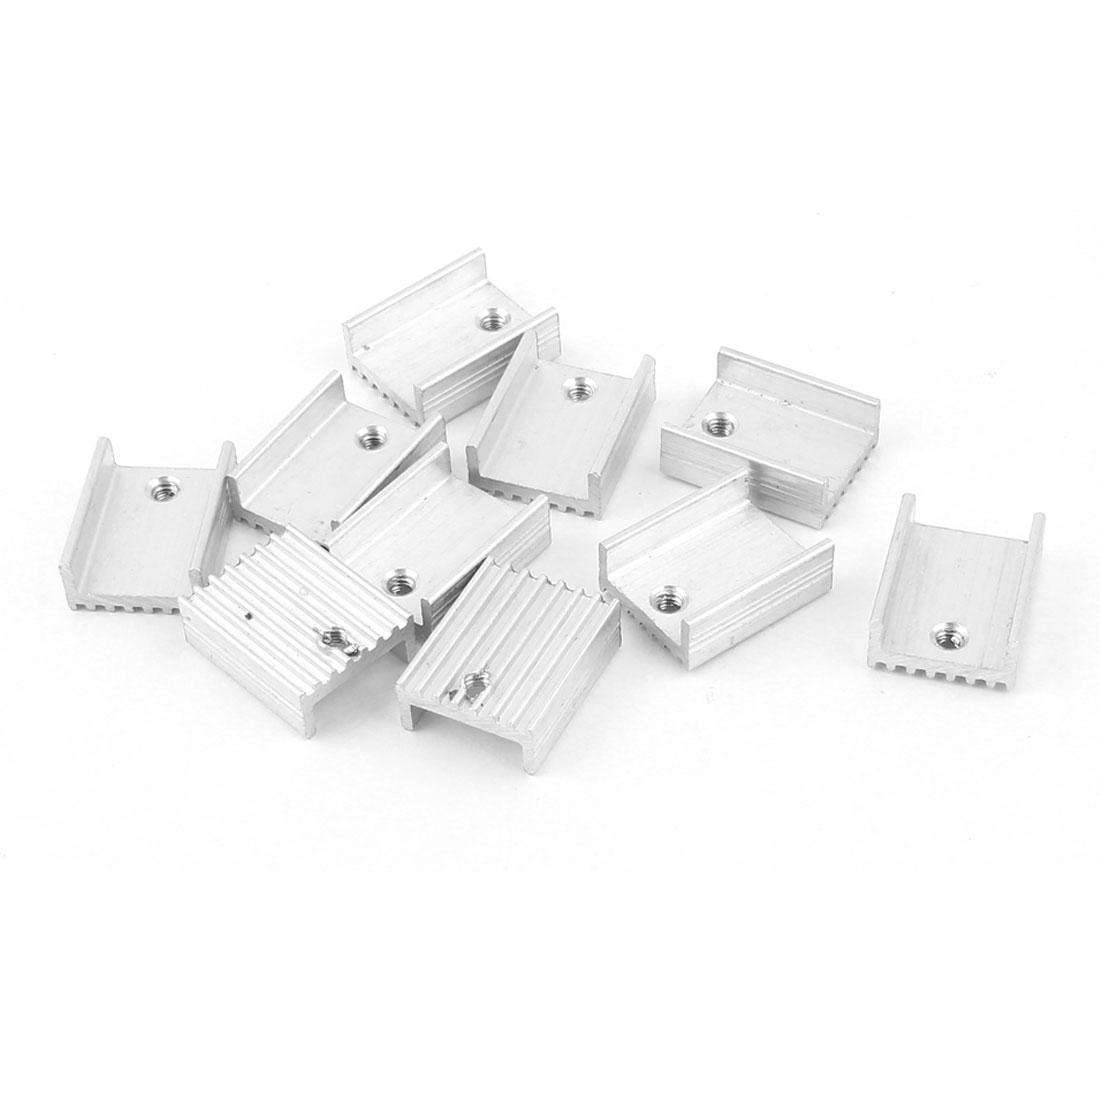 10 Pcs Silver Tone Aluminum Heat Sink 20x15x7mm for TO-220 Transistors